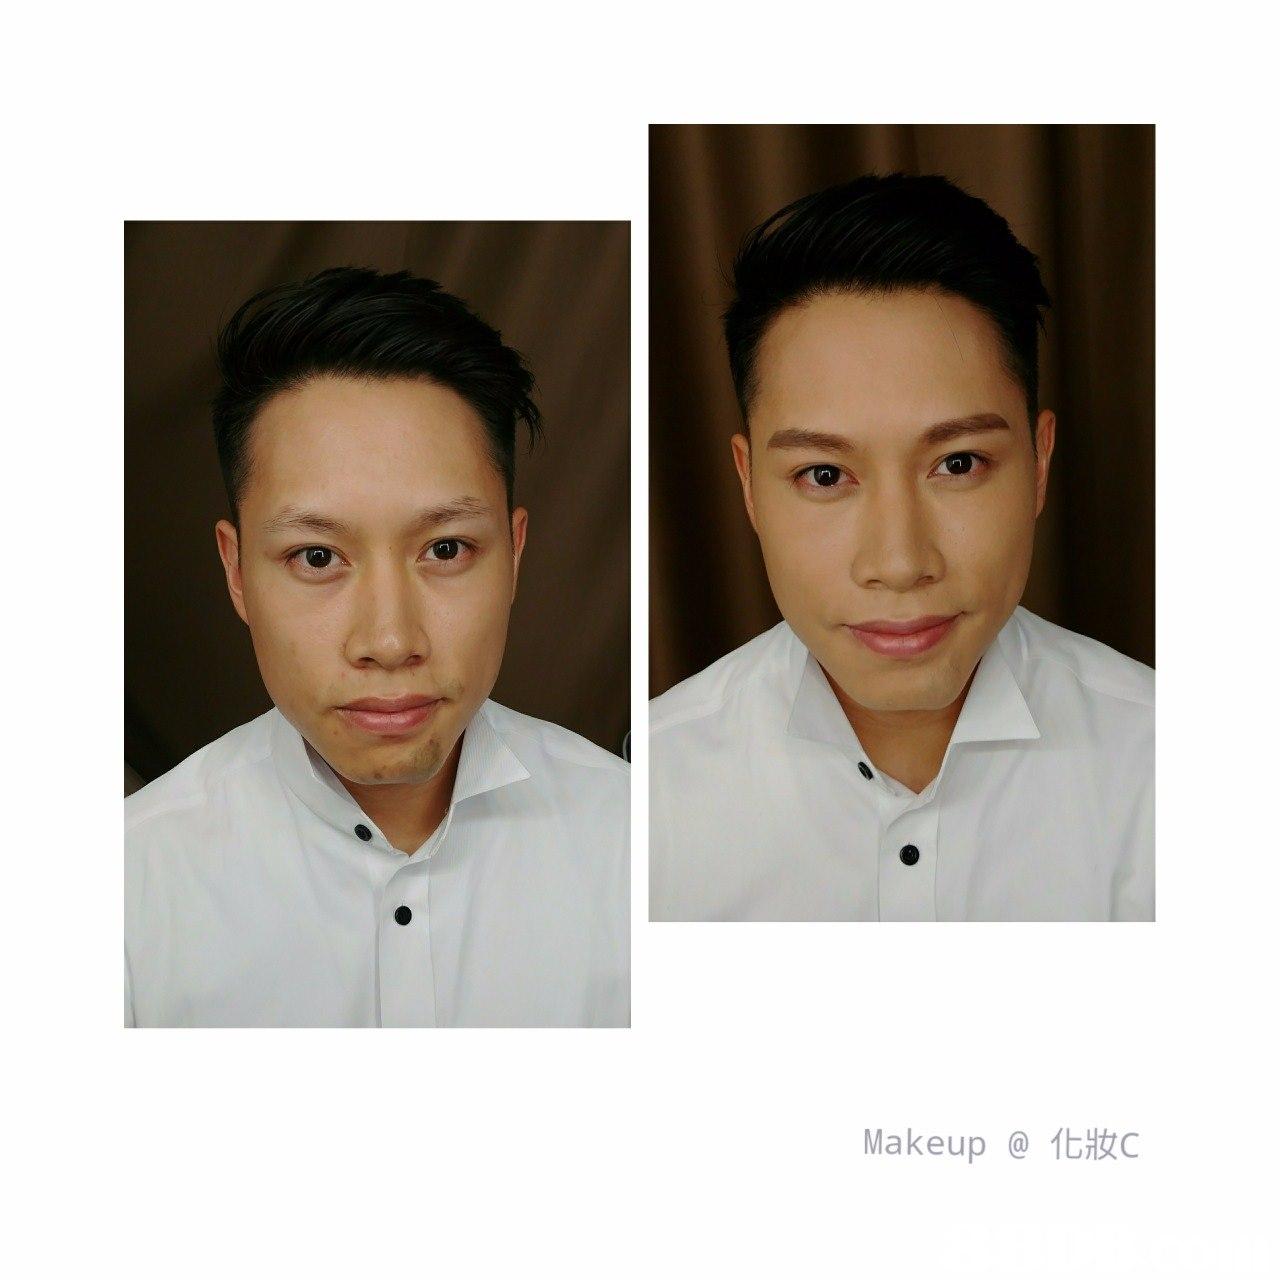 Makeup @化妝C,face,eyebrow,facial expression,chin,forehead